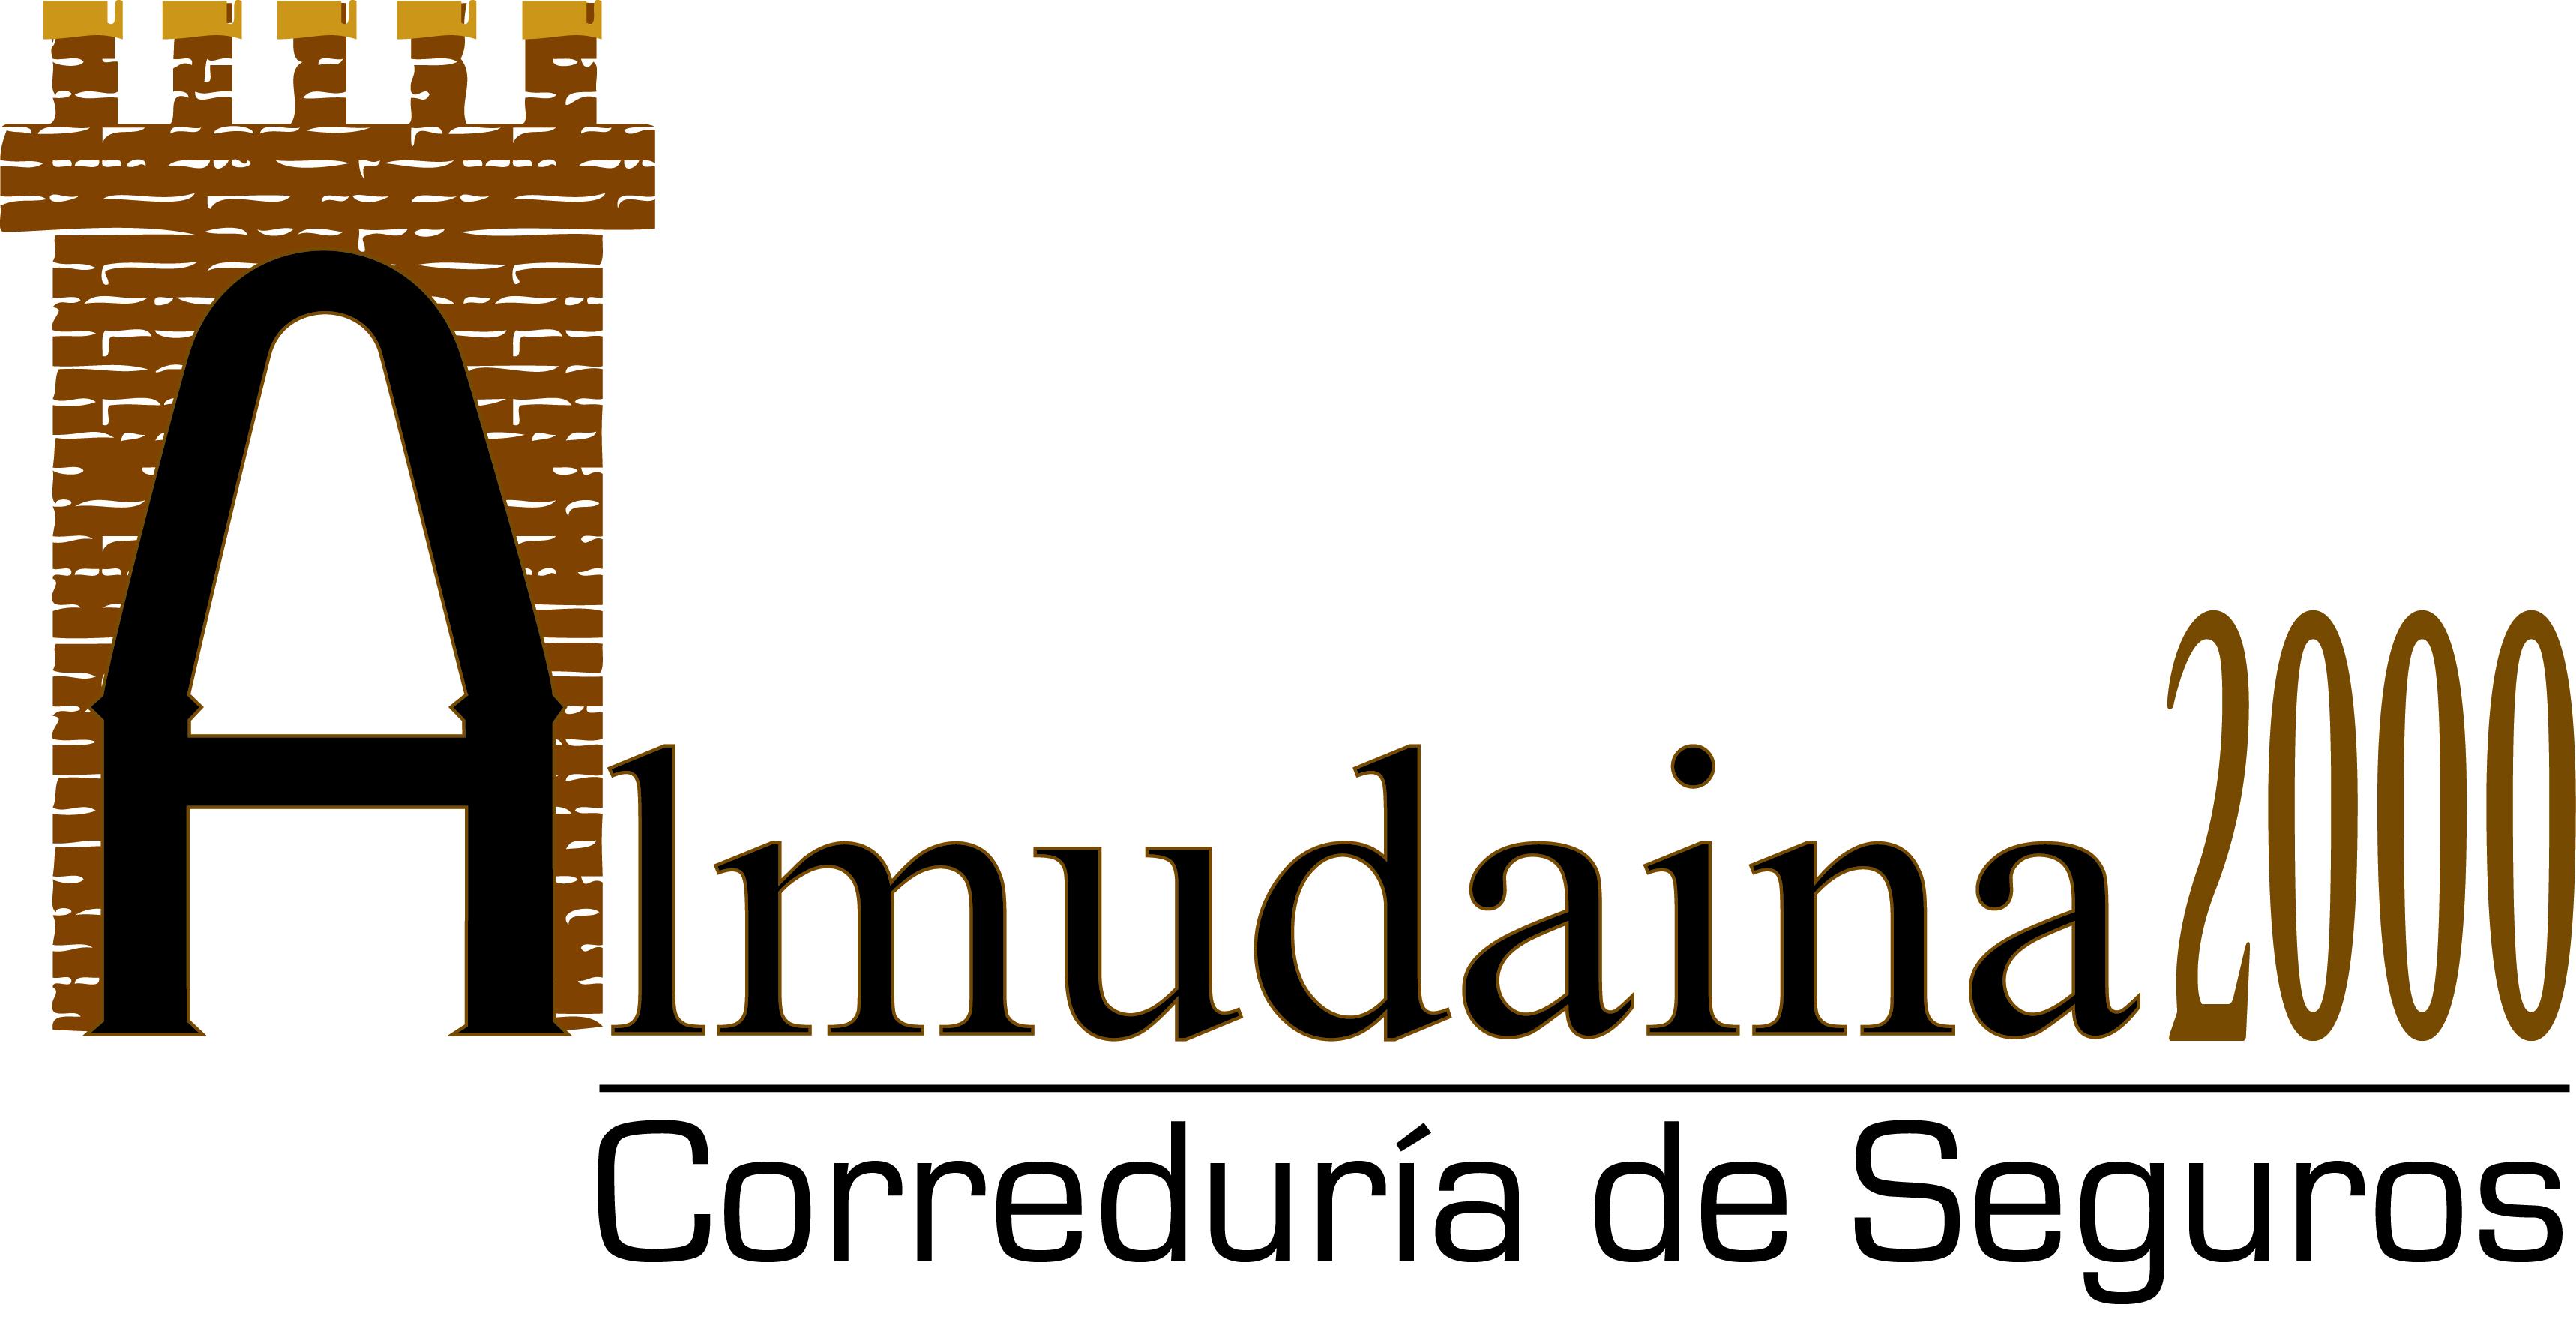 Almudaina 2000 Correduria de Seguros s.l.